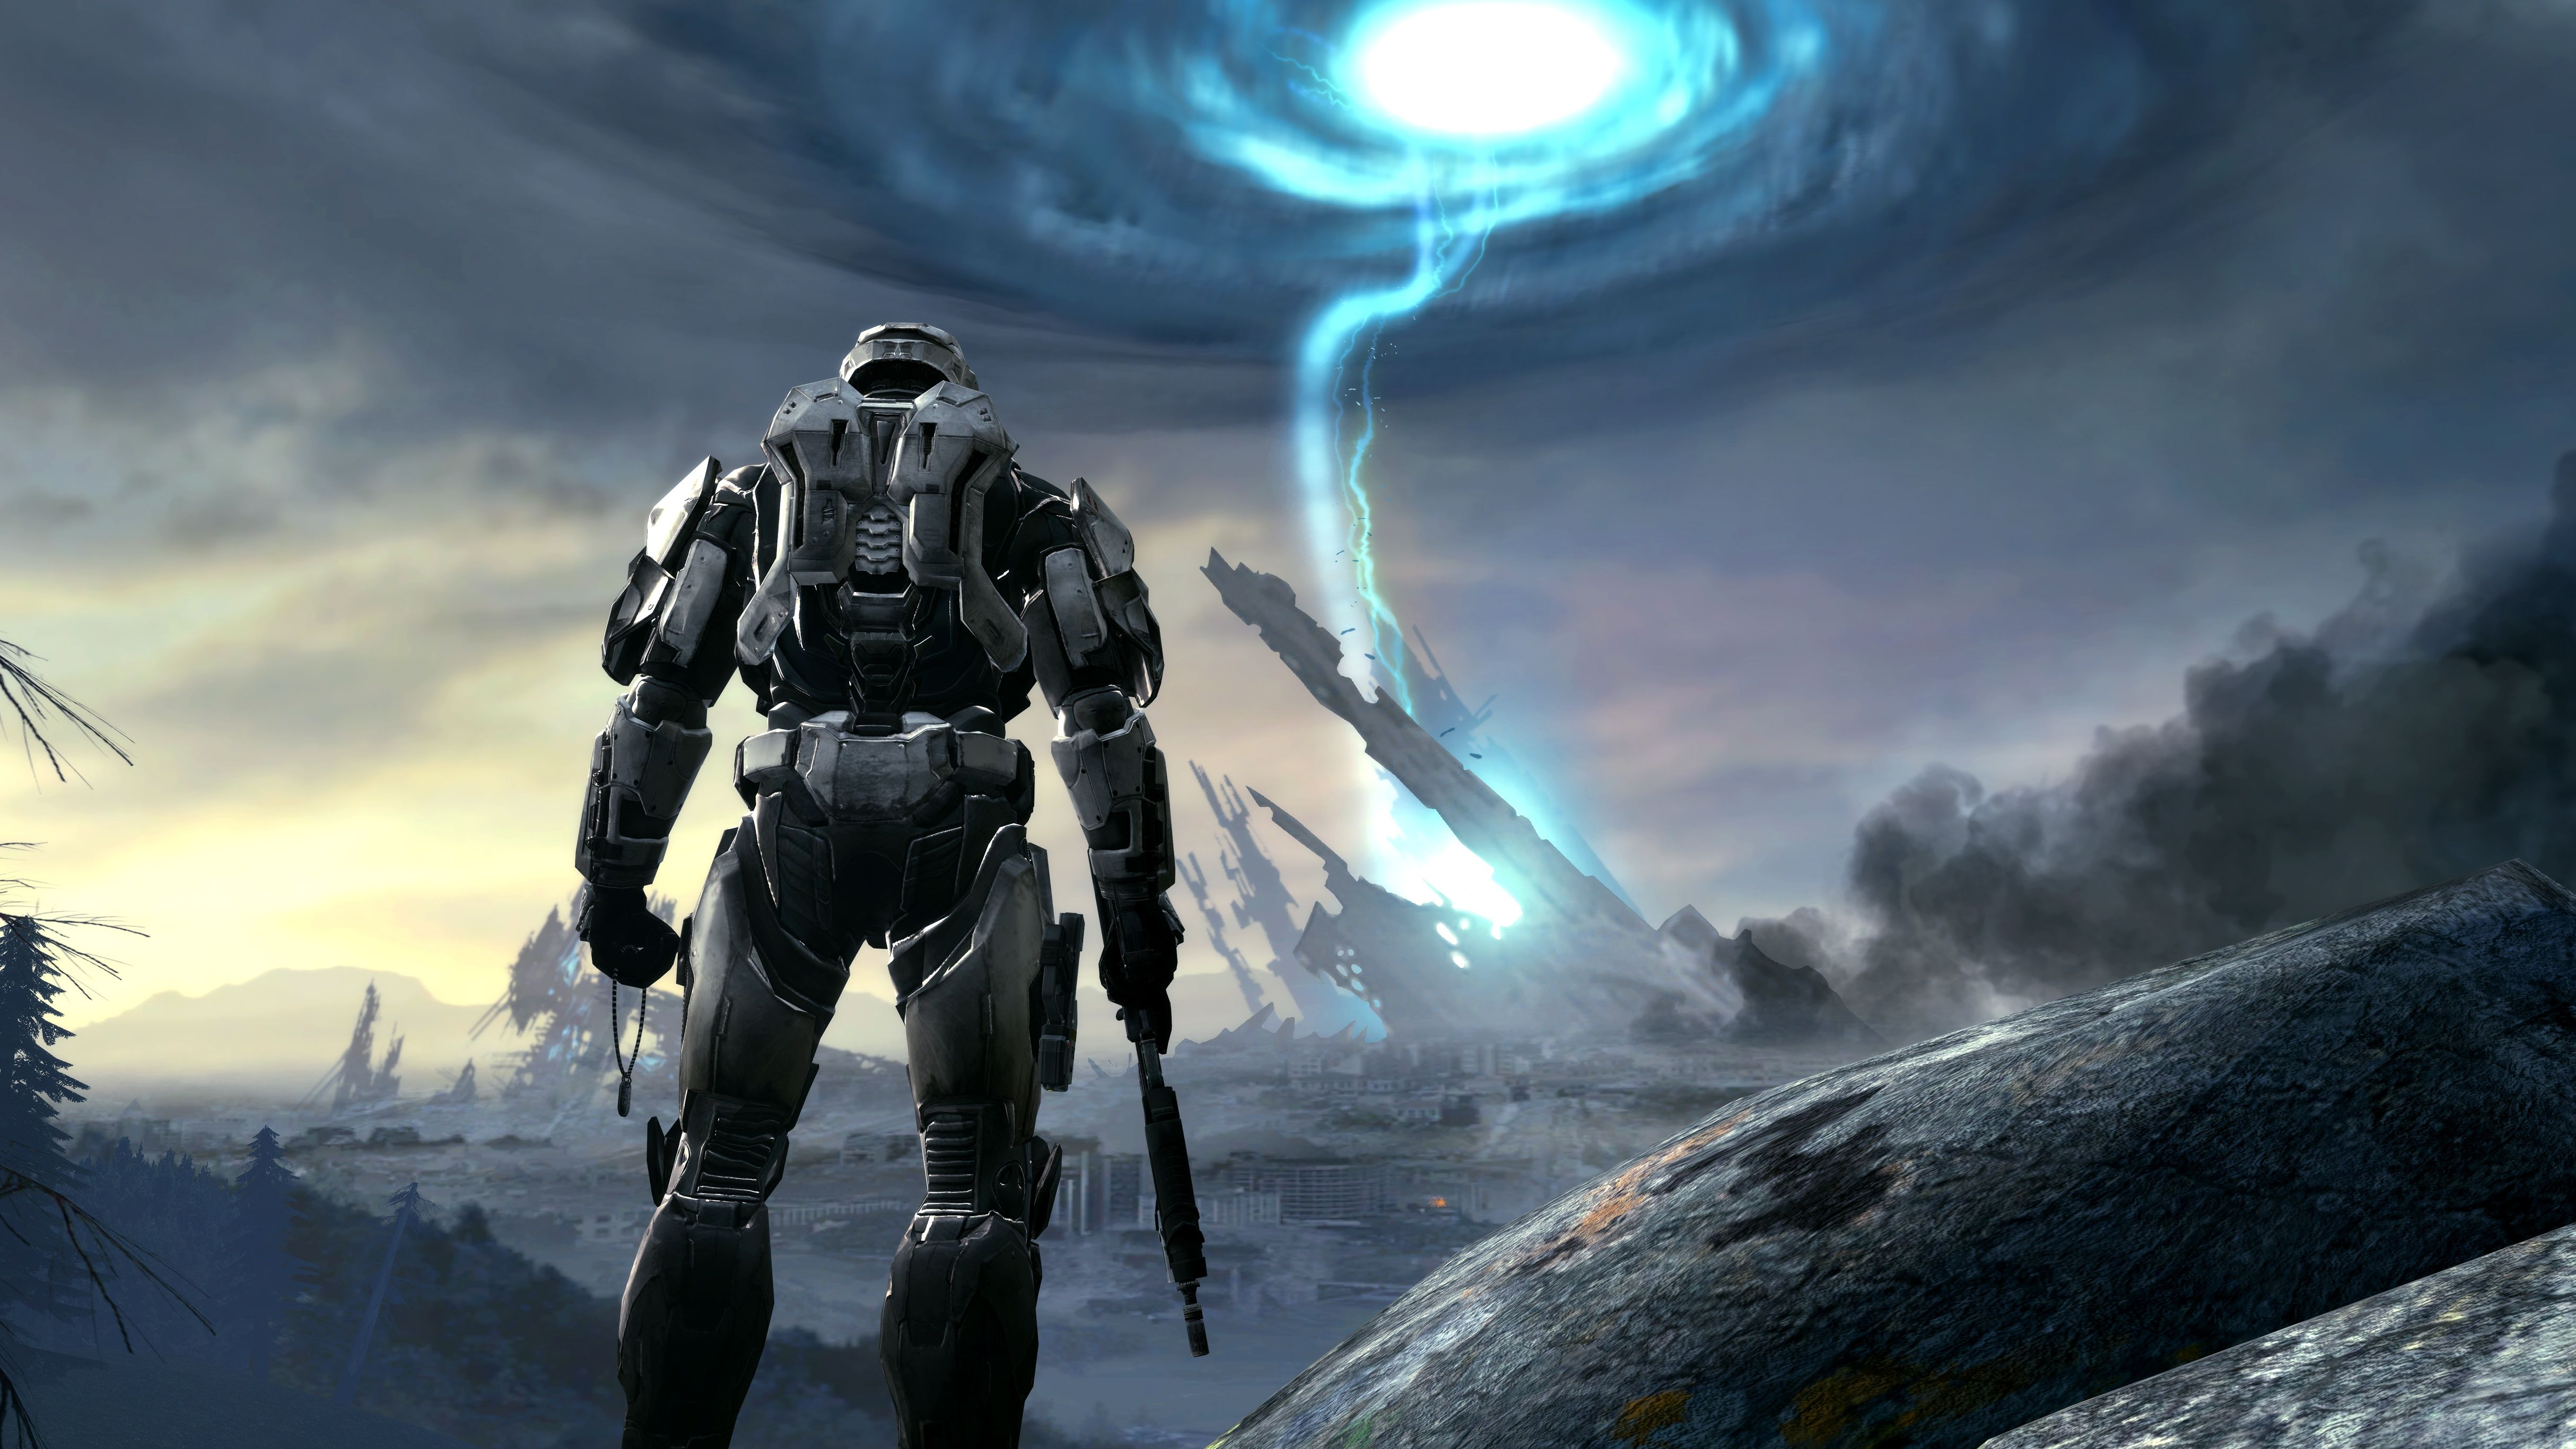 Halo Game Artwork In 4k Hq Wallpaper Portal Creative